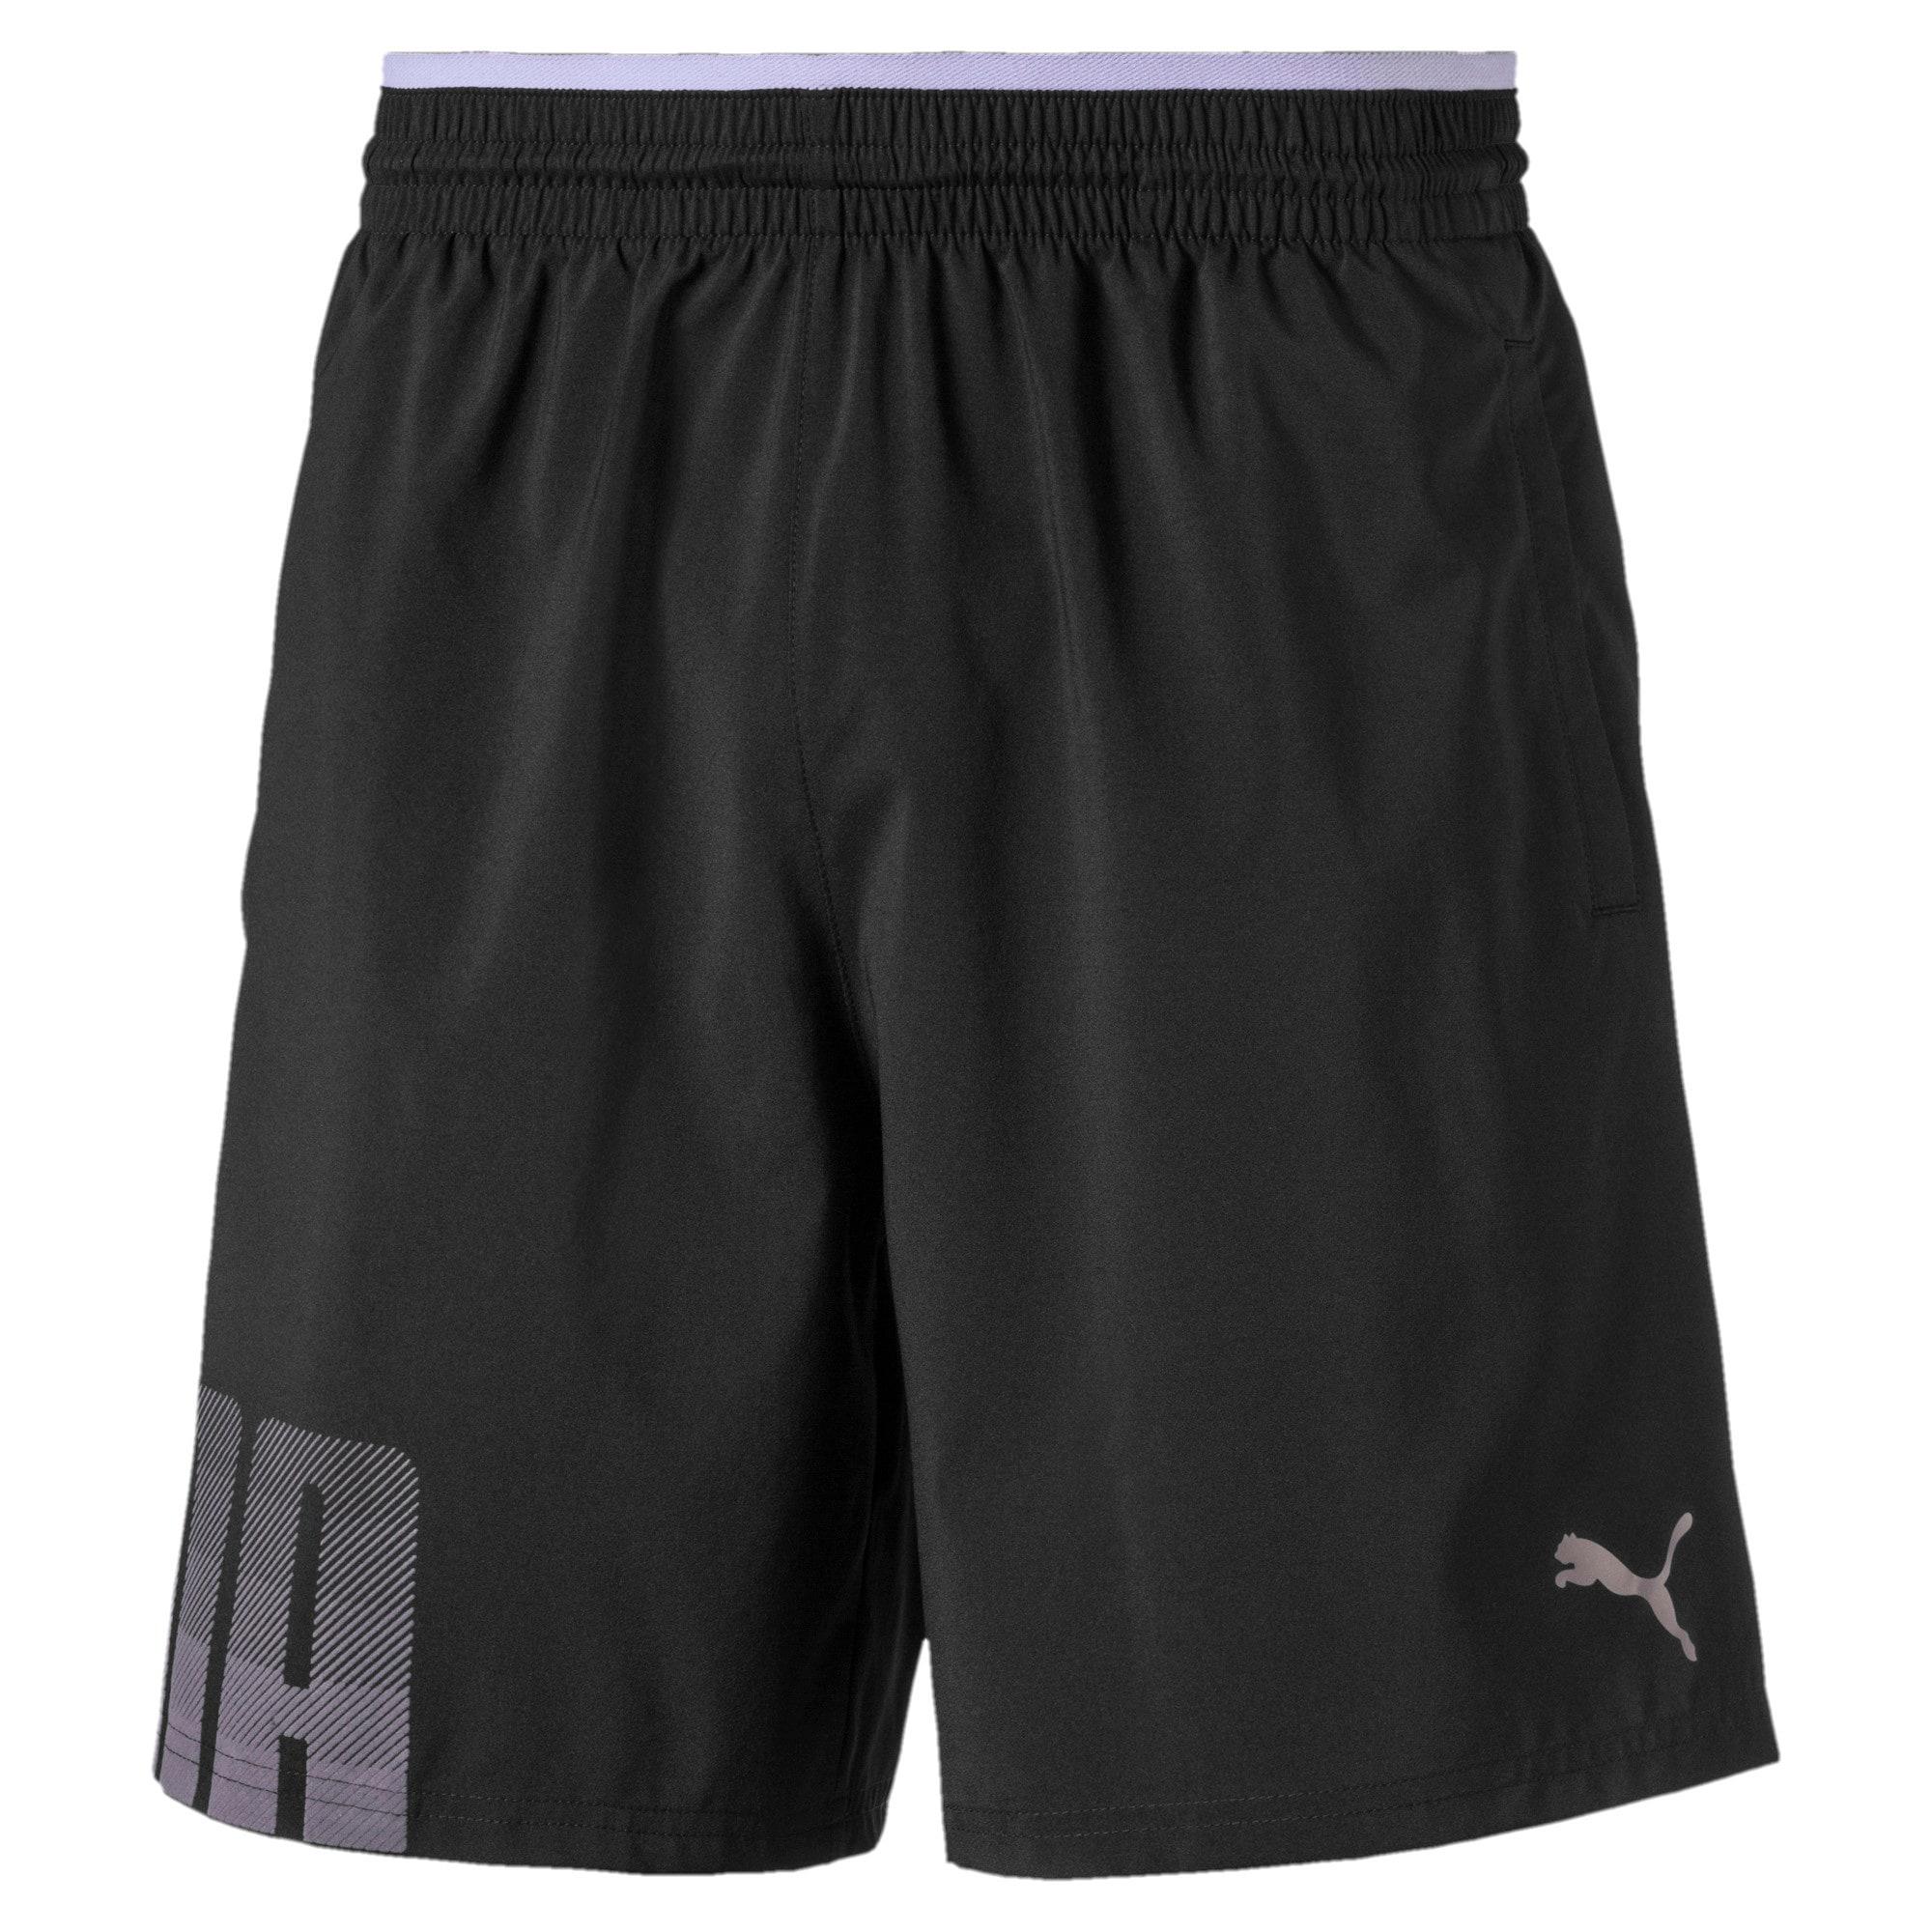 Thumbnail 4 of Collective Woven Men's Training Shorts, Puma Black, medium